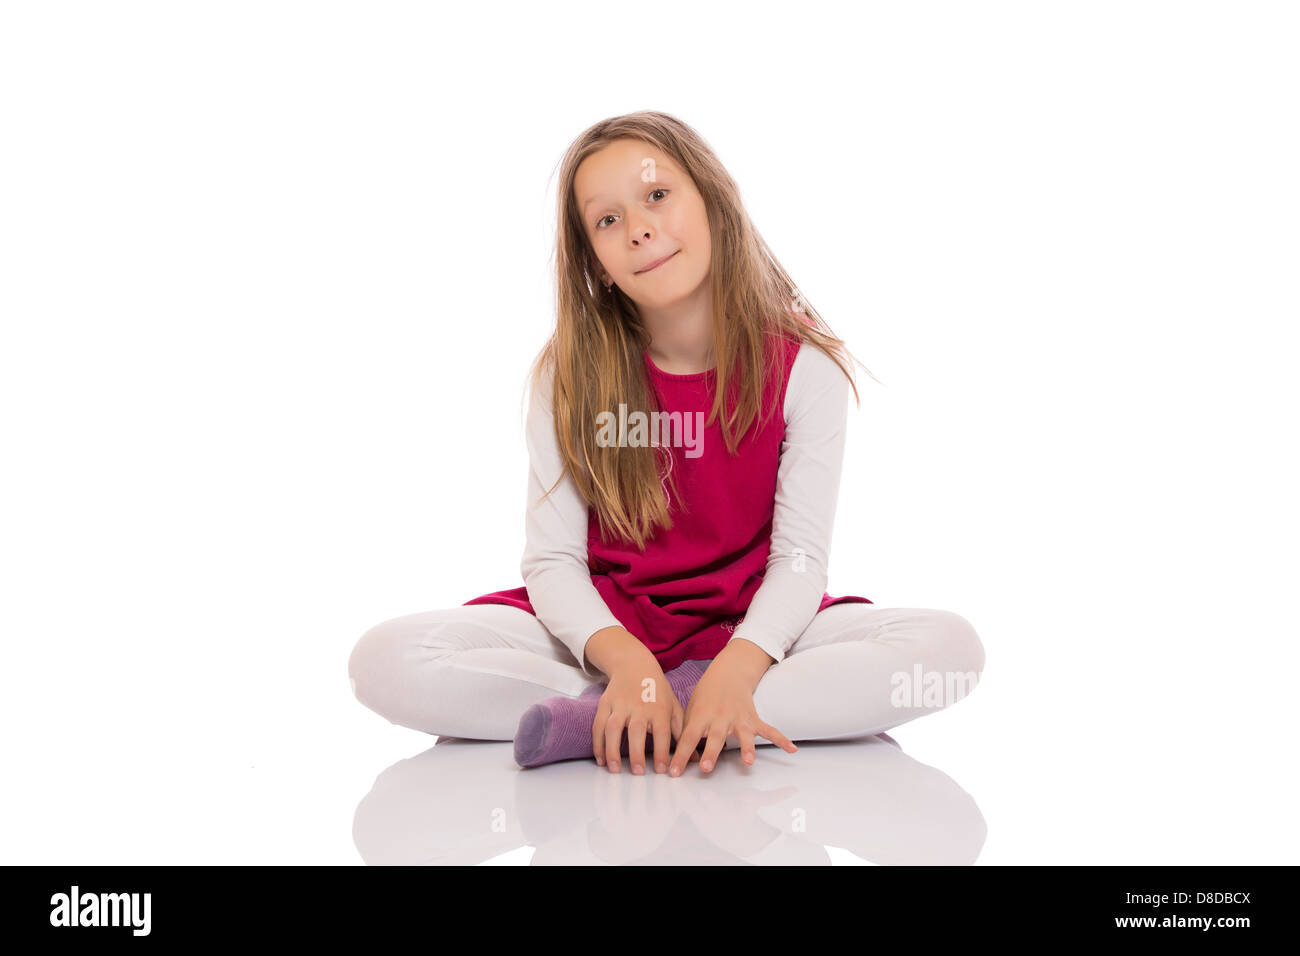 Young teen crossed legs